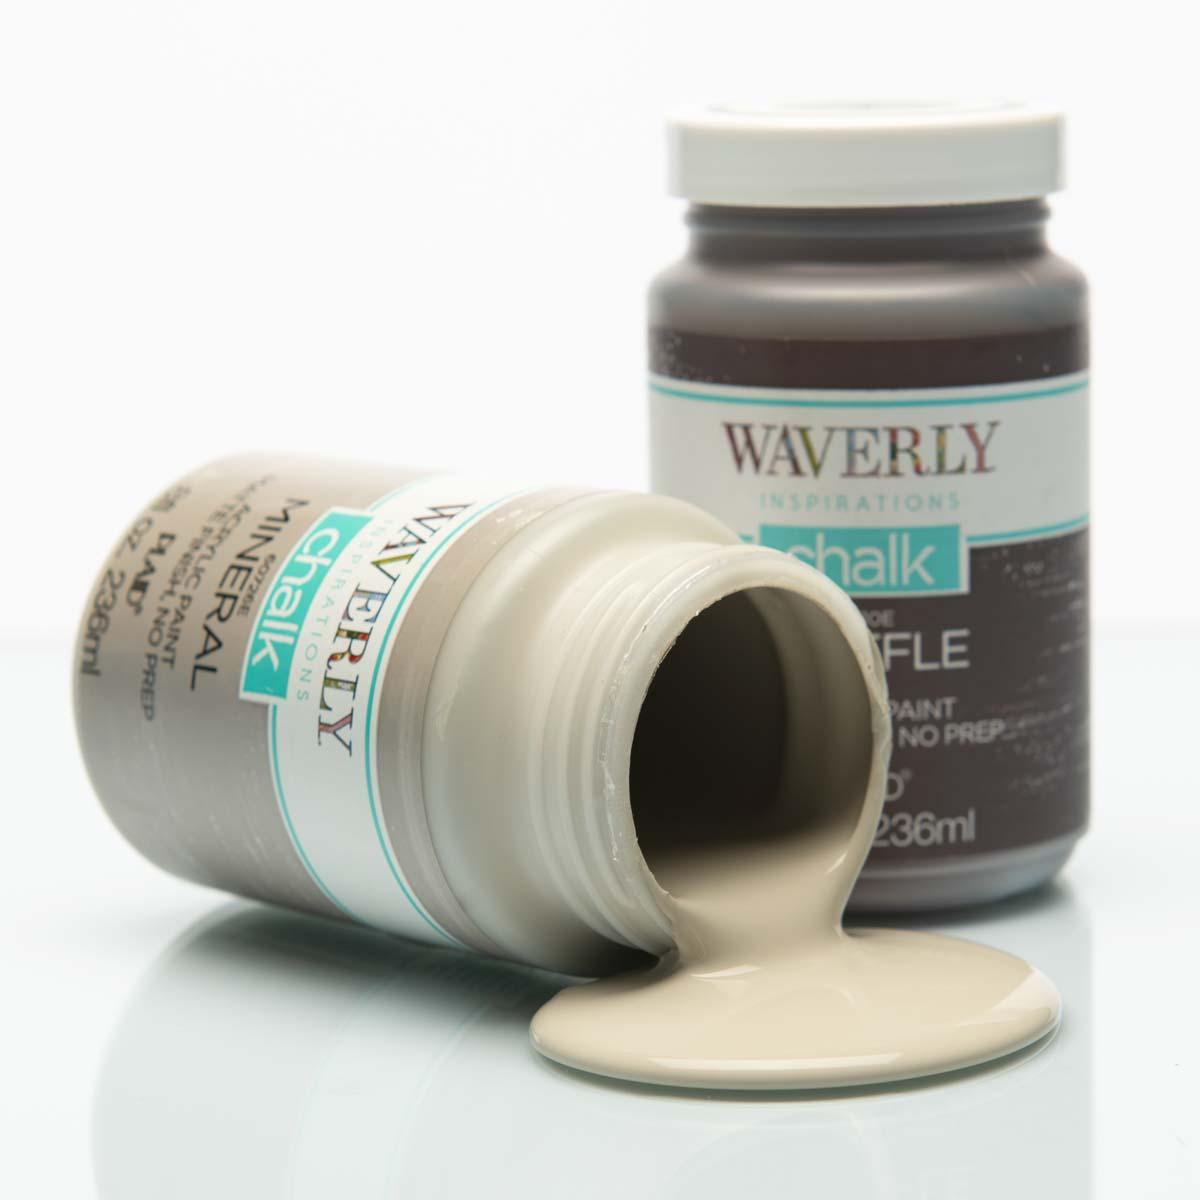 Waverly ® Inspirations Chalk Finish Acrylic Paint Set - Grays, 3 pc. - 13406